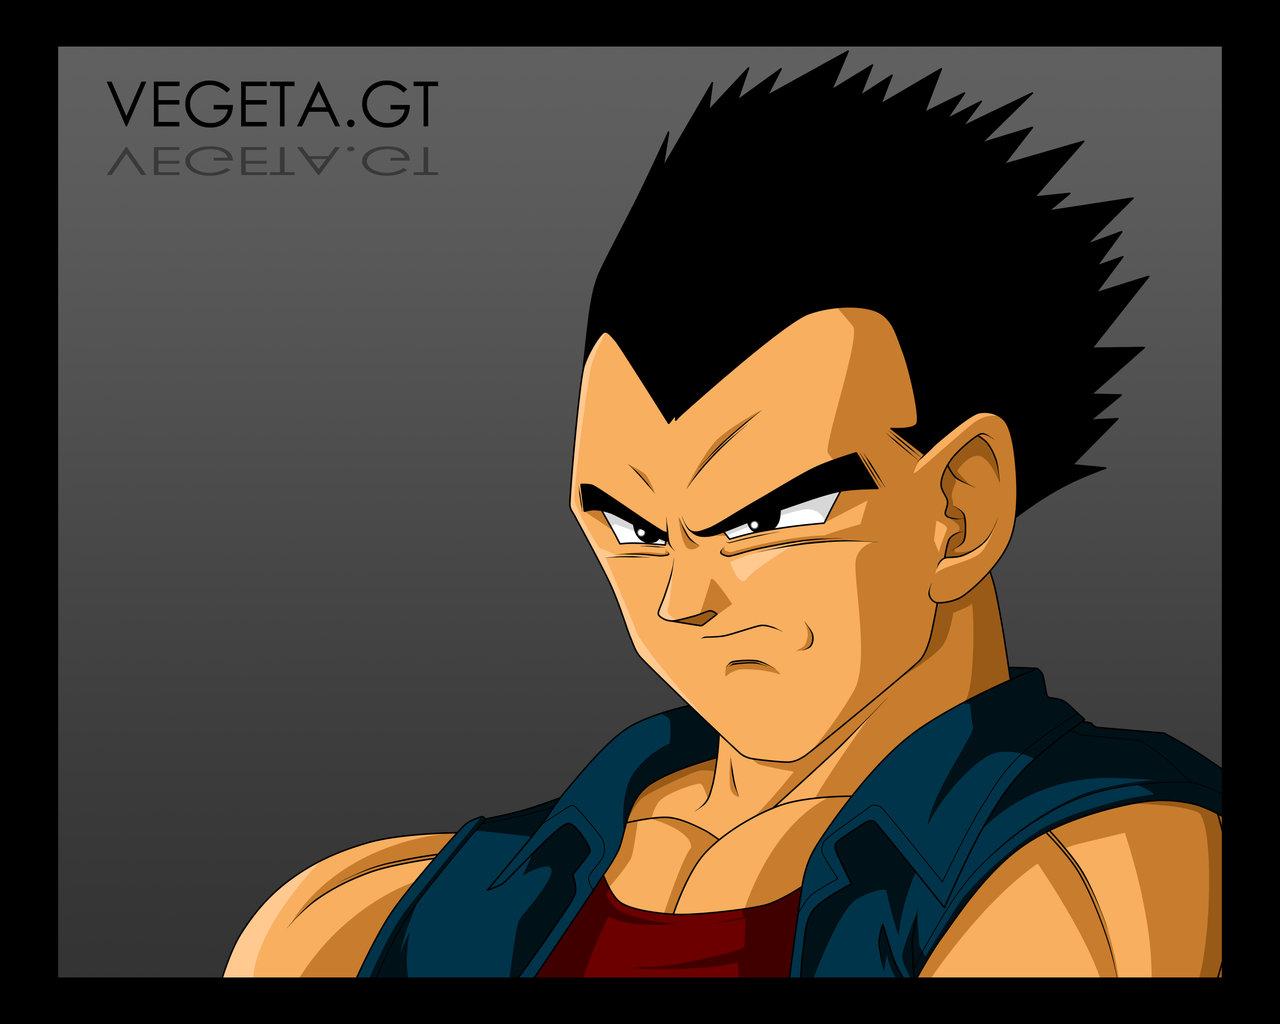 Dragon ball gt goku vegeta y gogeta taringa - Vegeta dragon ball gt ...